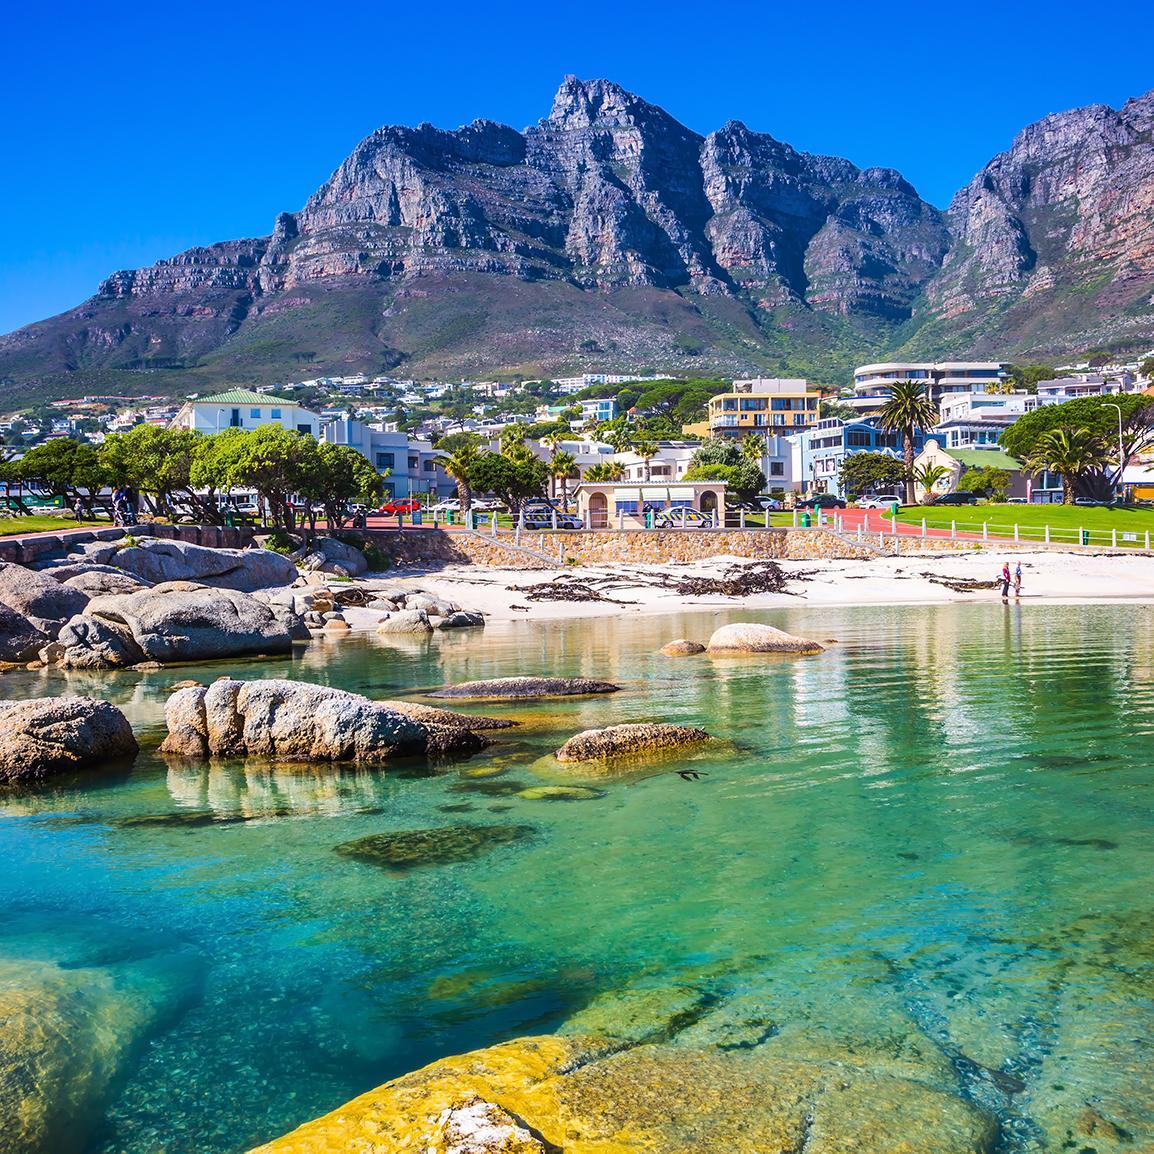 Stirring Cape Town mountain views